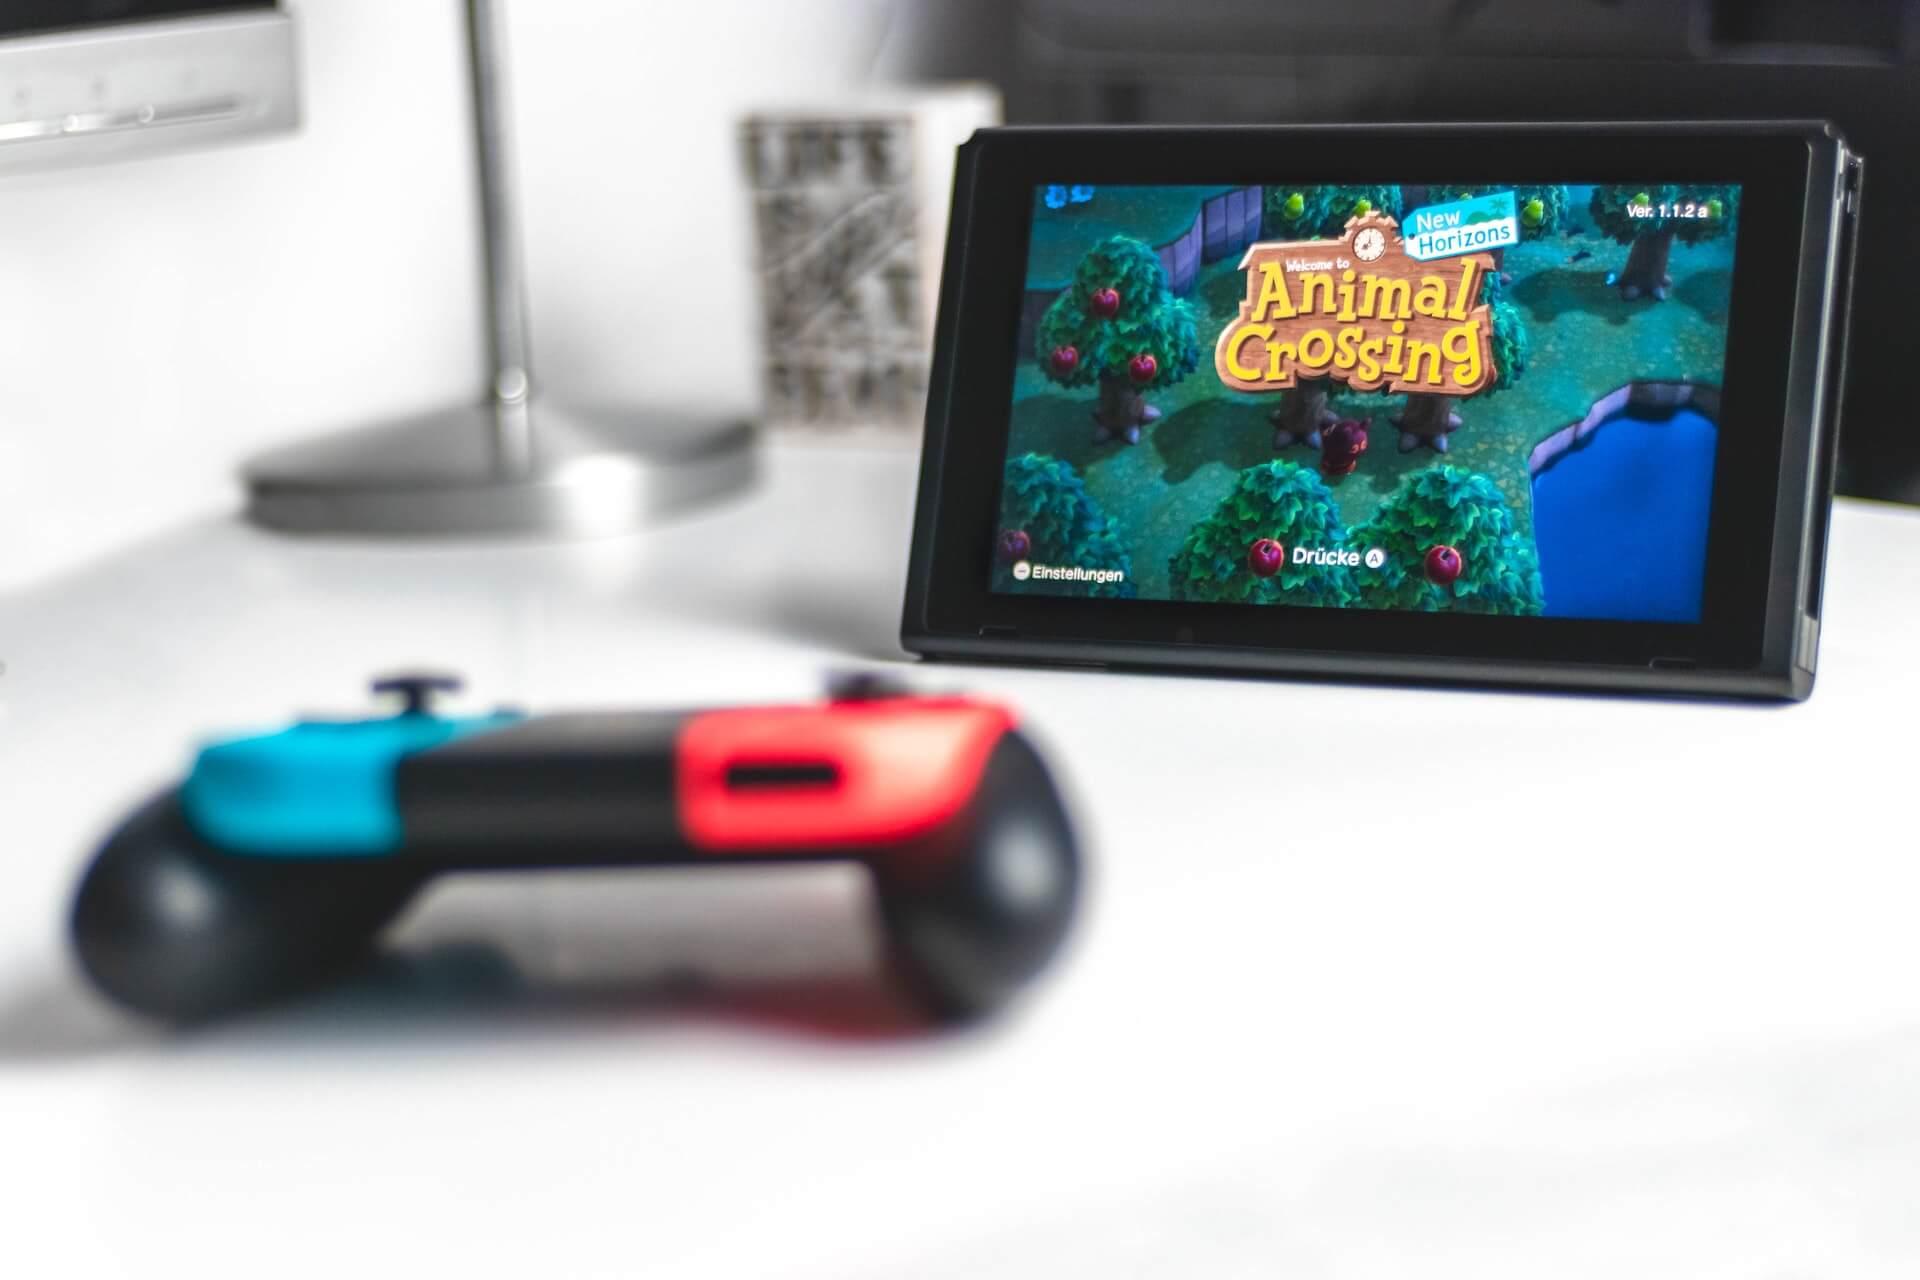 Nintendo Switchの新モデルが来年初旬に登場する!?製造メーカーからの情報がリーク tech200825_nintendoswitch_main